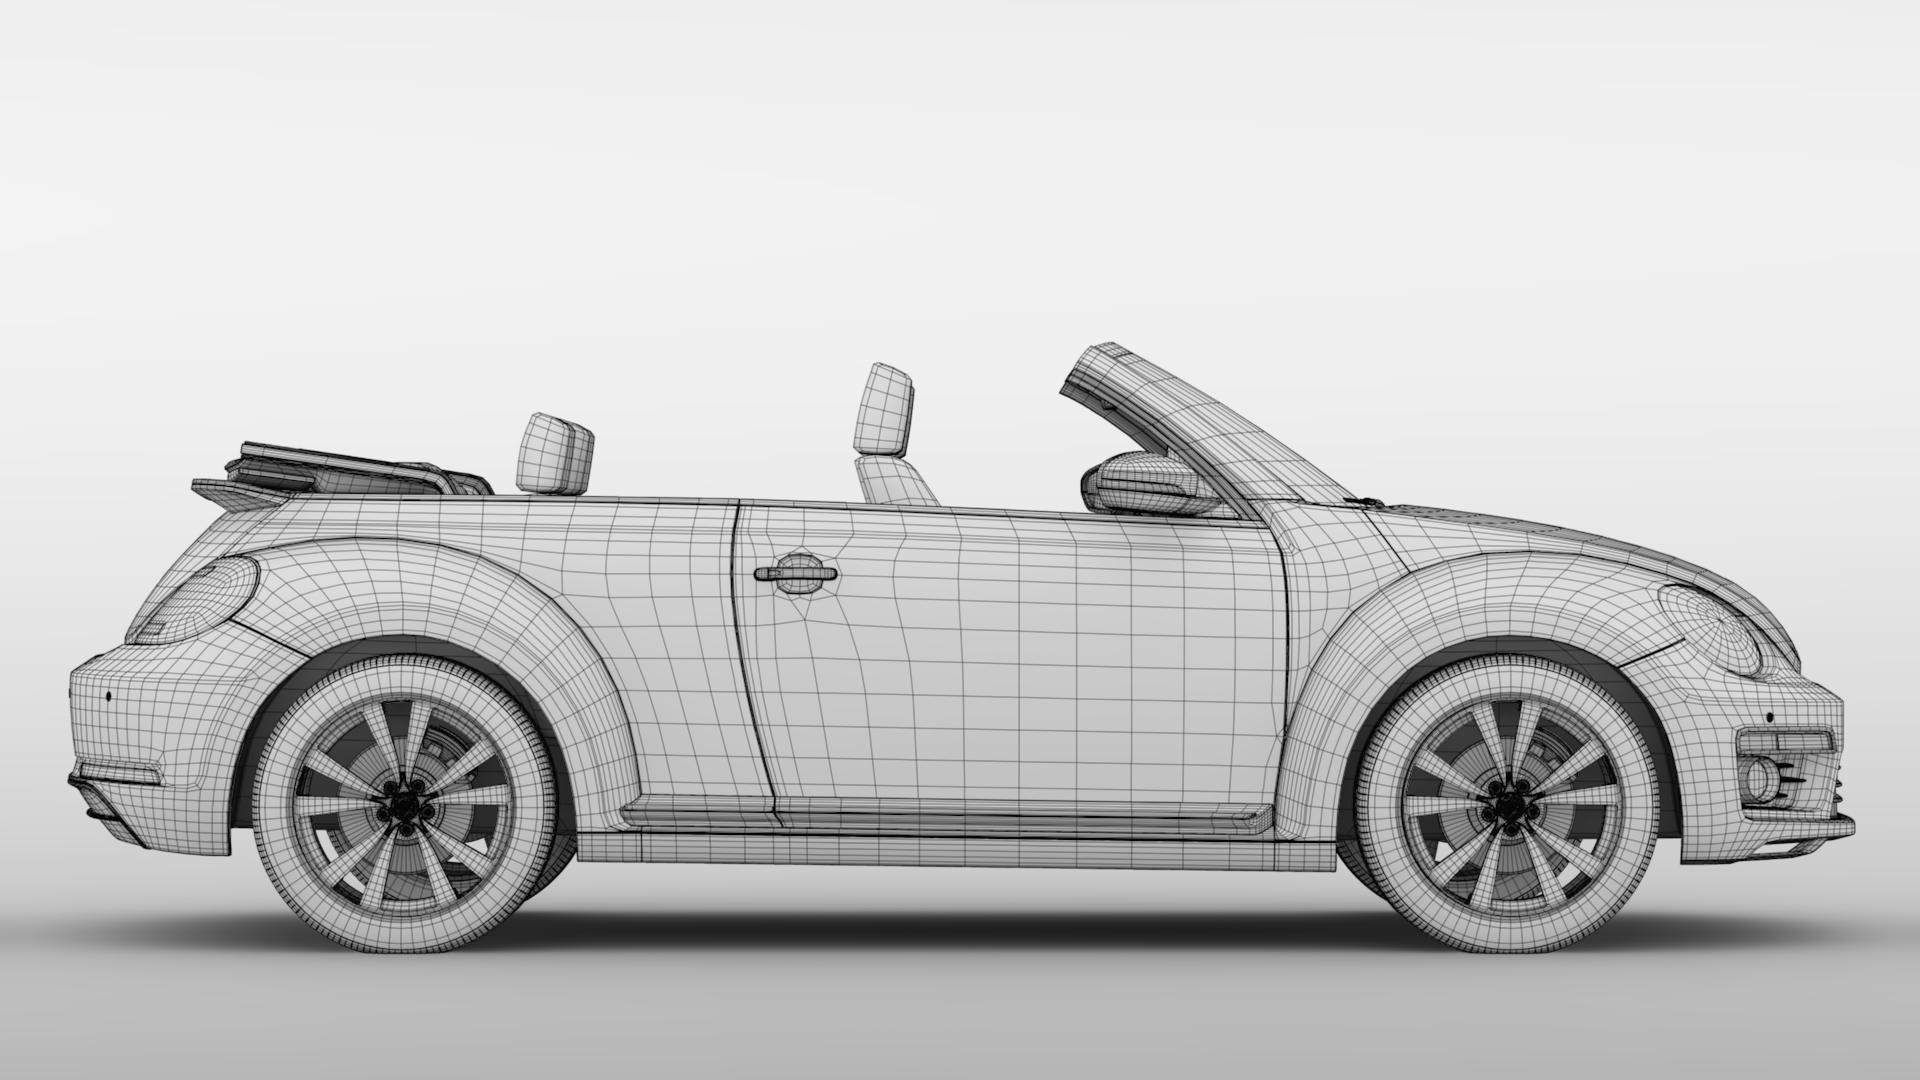 vw beetle cabriolet 2017 3d model 3ds max fbx c4d lwo ma mb hrc xsi obj 221608